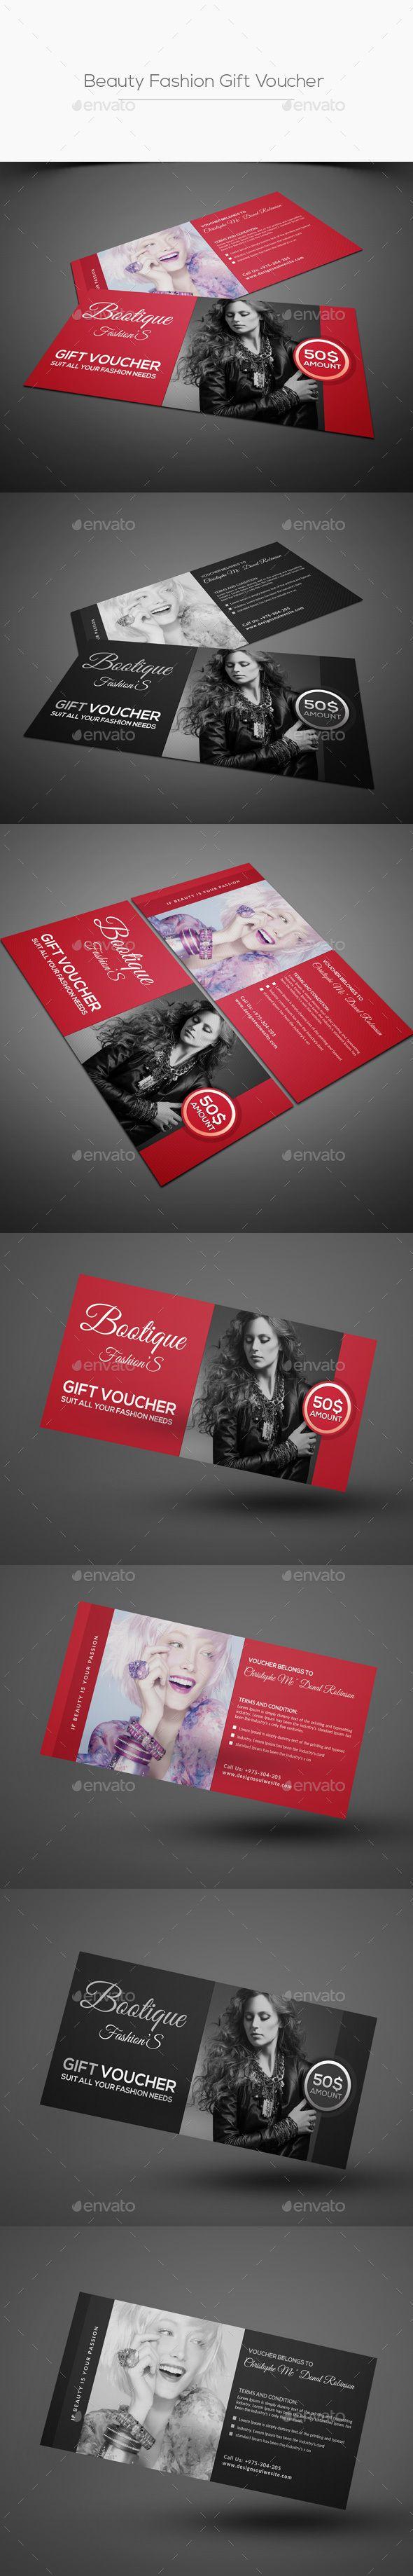 65 best Gift Voucher images on Pinterest | Gift cards, Gift vouchers ...